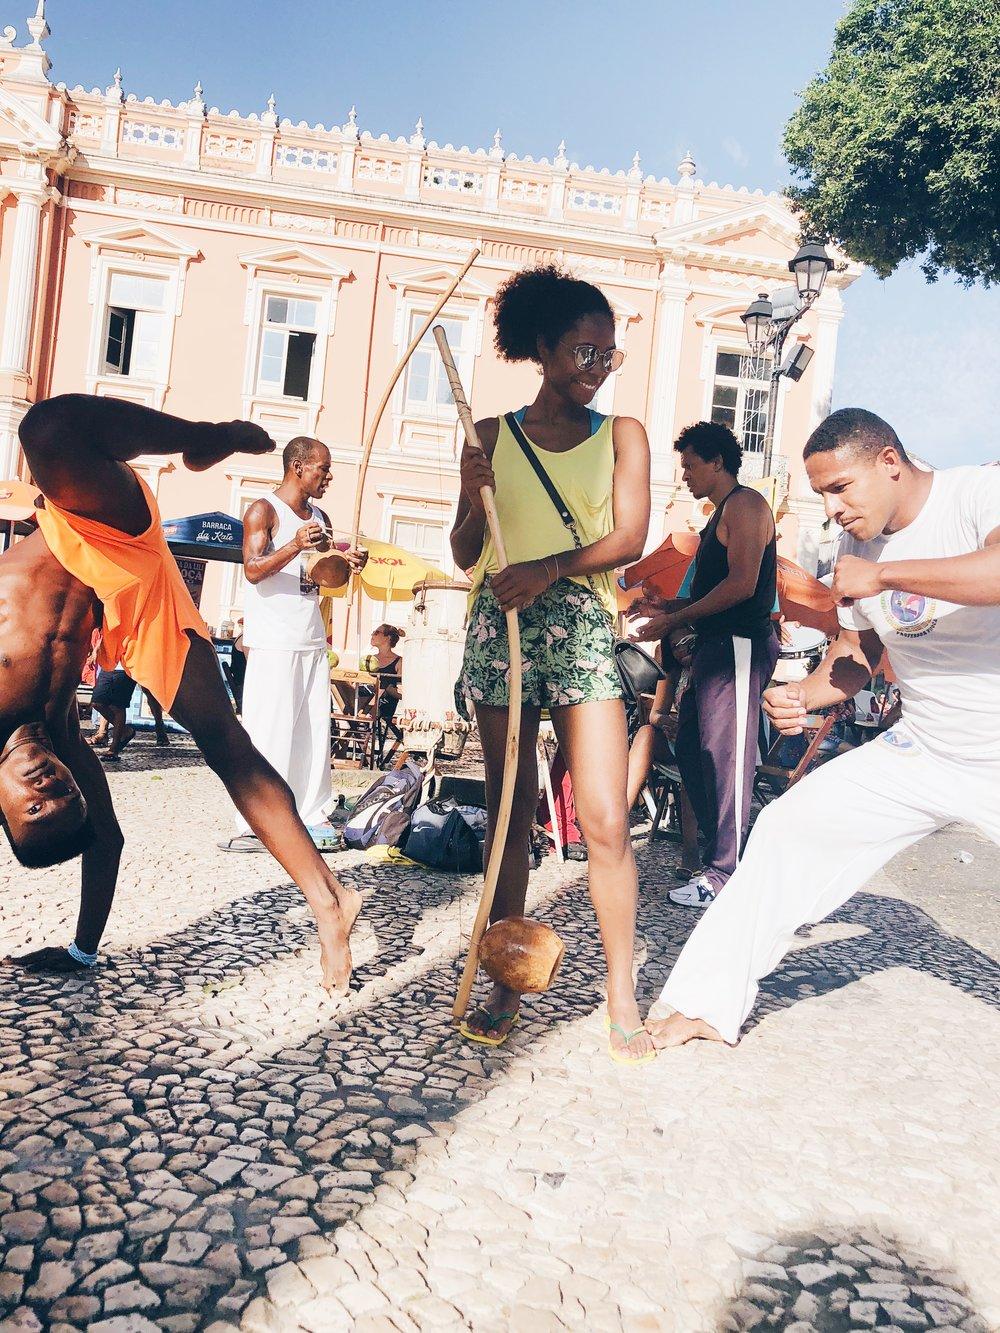 Live capoeira jogo (game) in the Terreiro de Jesus in Pelo.